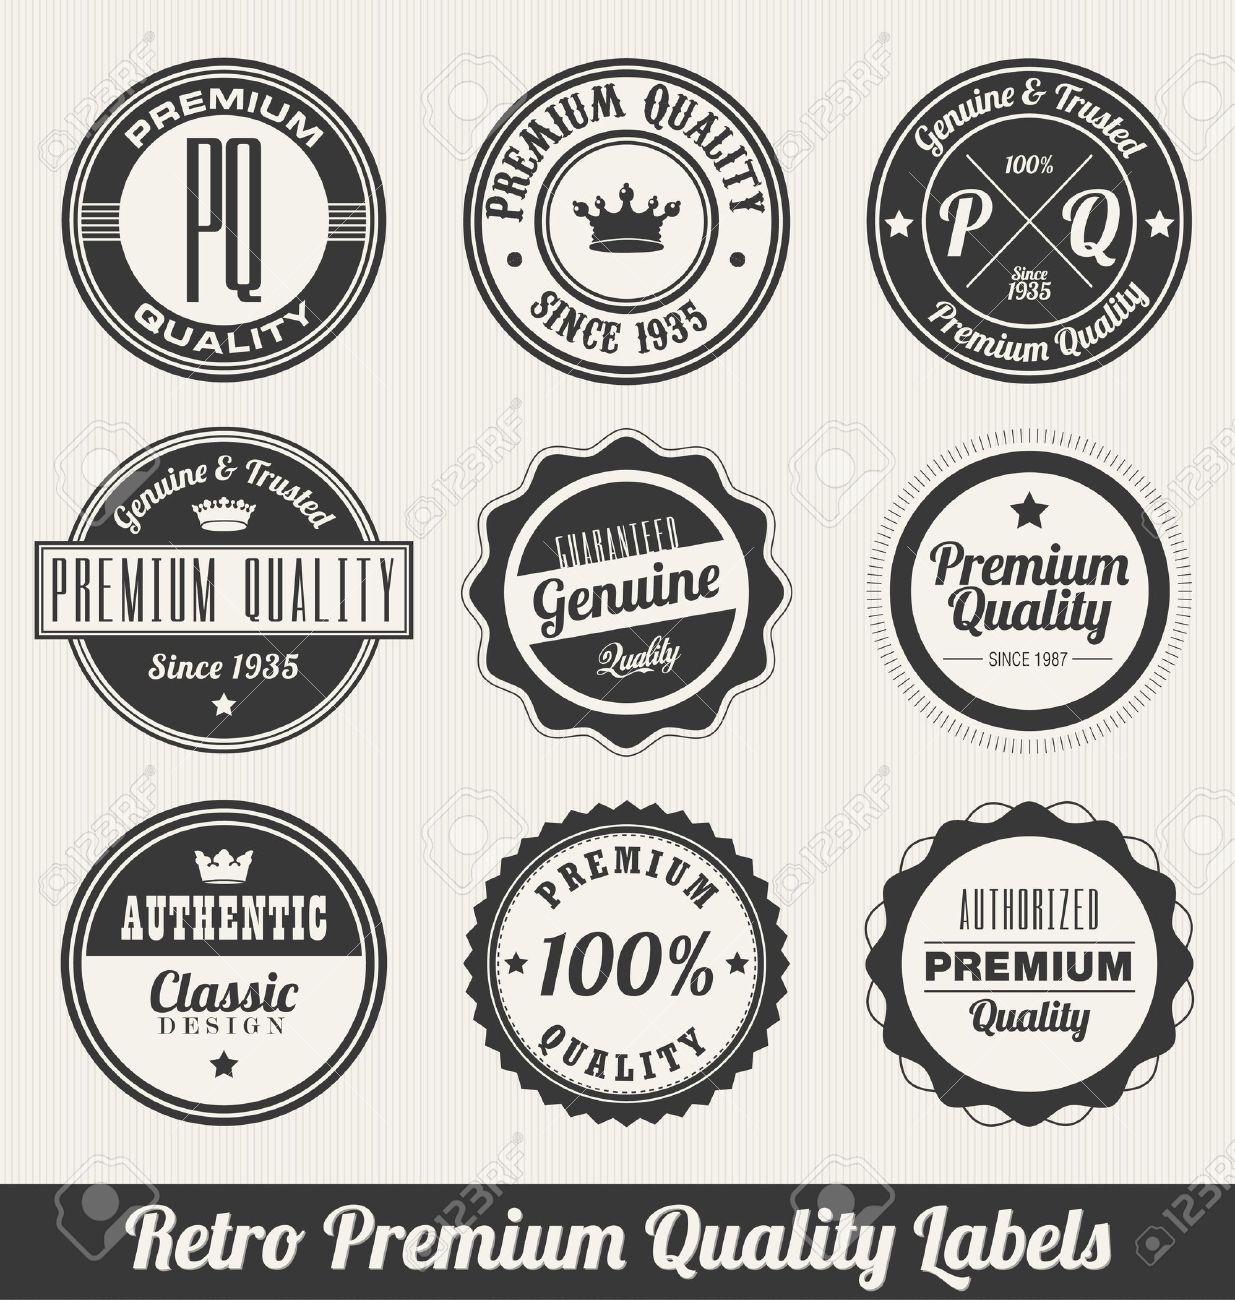 Retro Premium Quality Labels - Monochrome version Stock Vector - 14556195